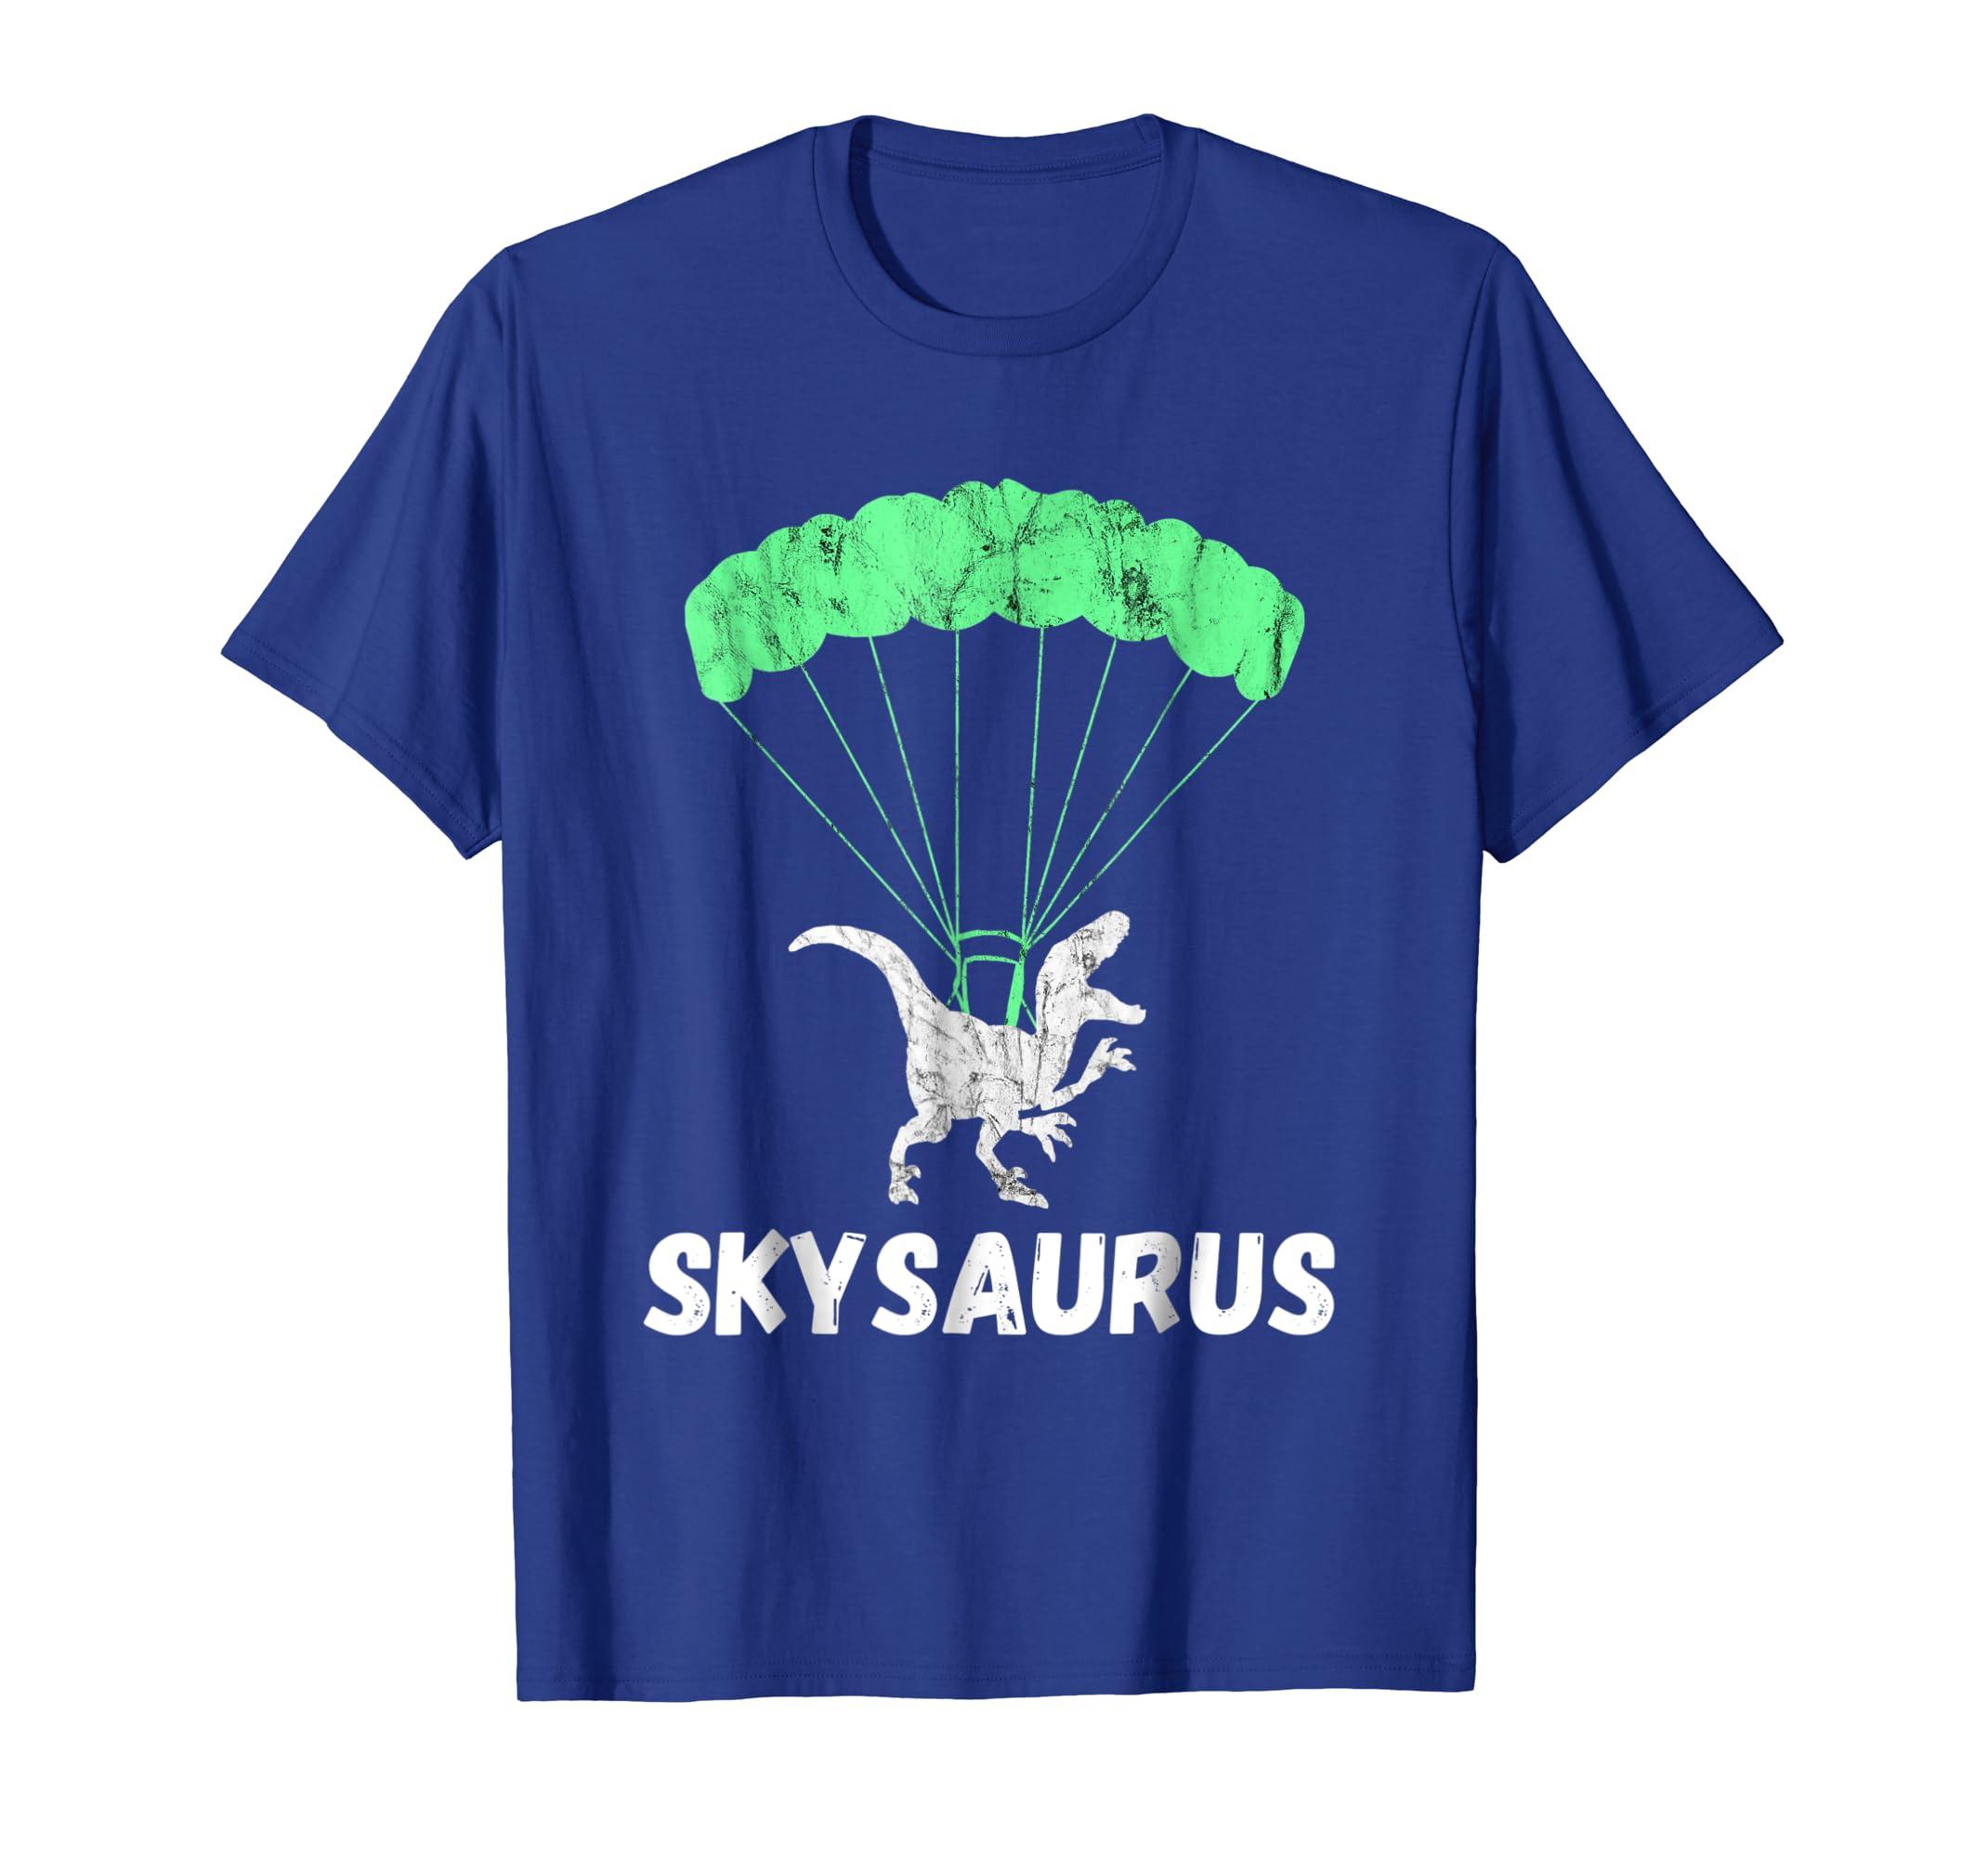 df2a6e91 Amazon.com: Skydiver Dinosaurs Skydiving Parachute Jumping Trex T-Shirt:  Clothing